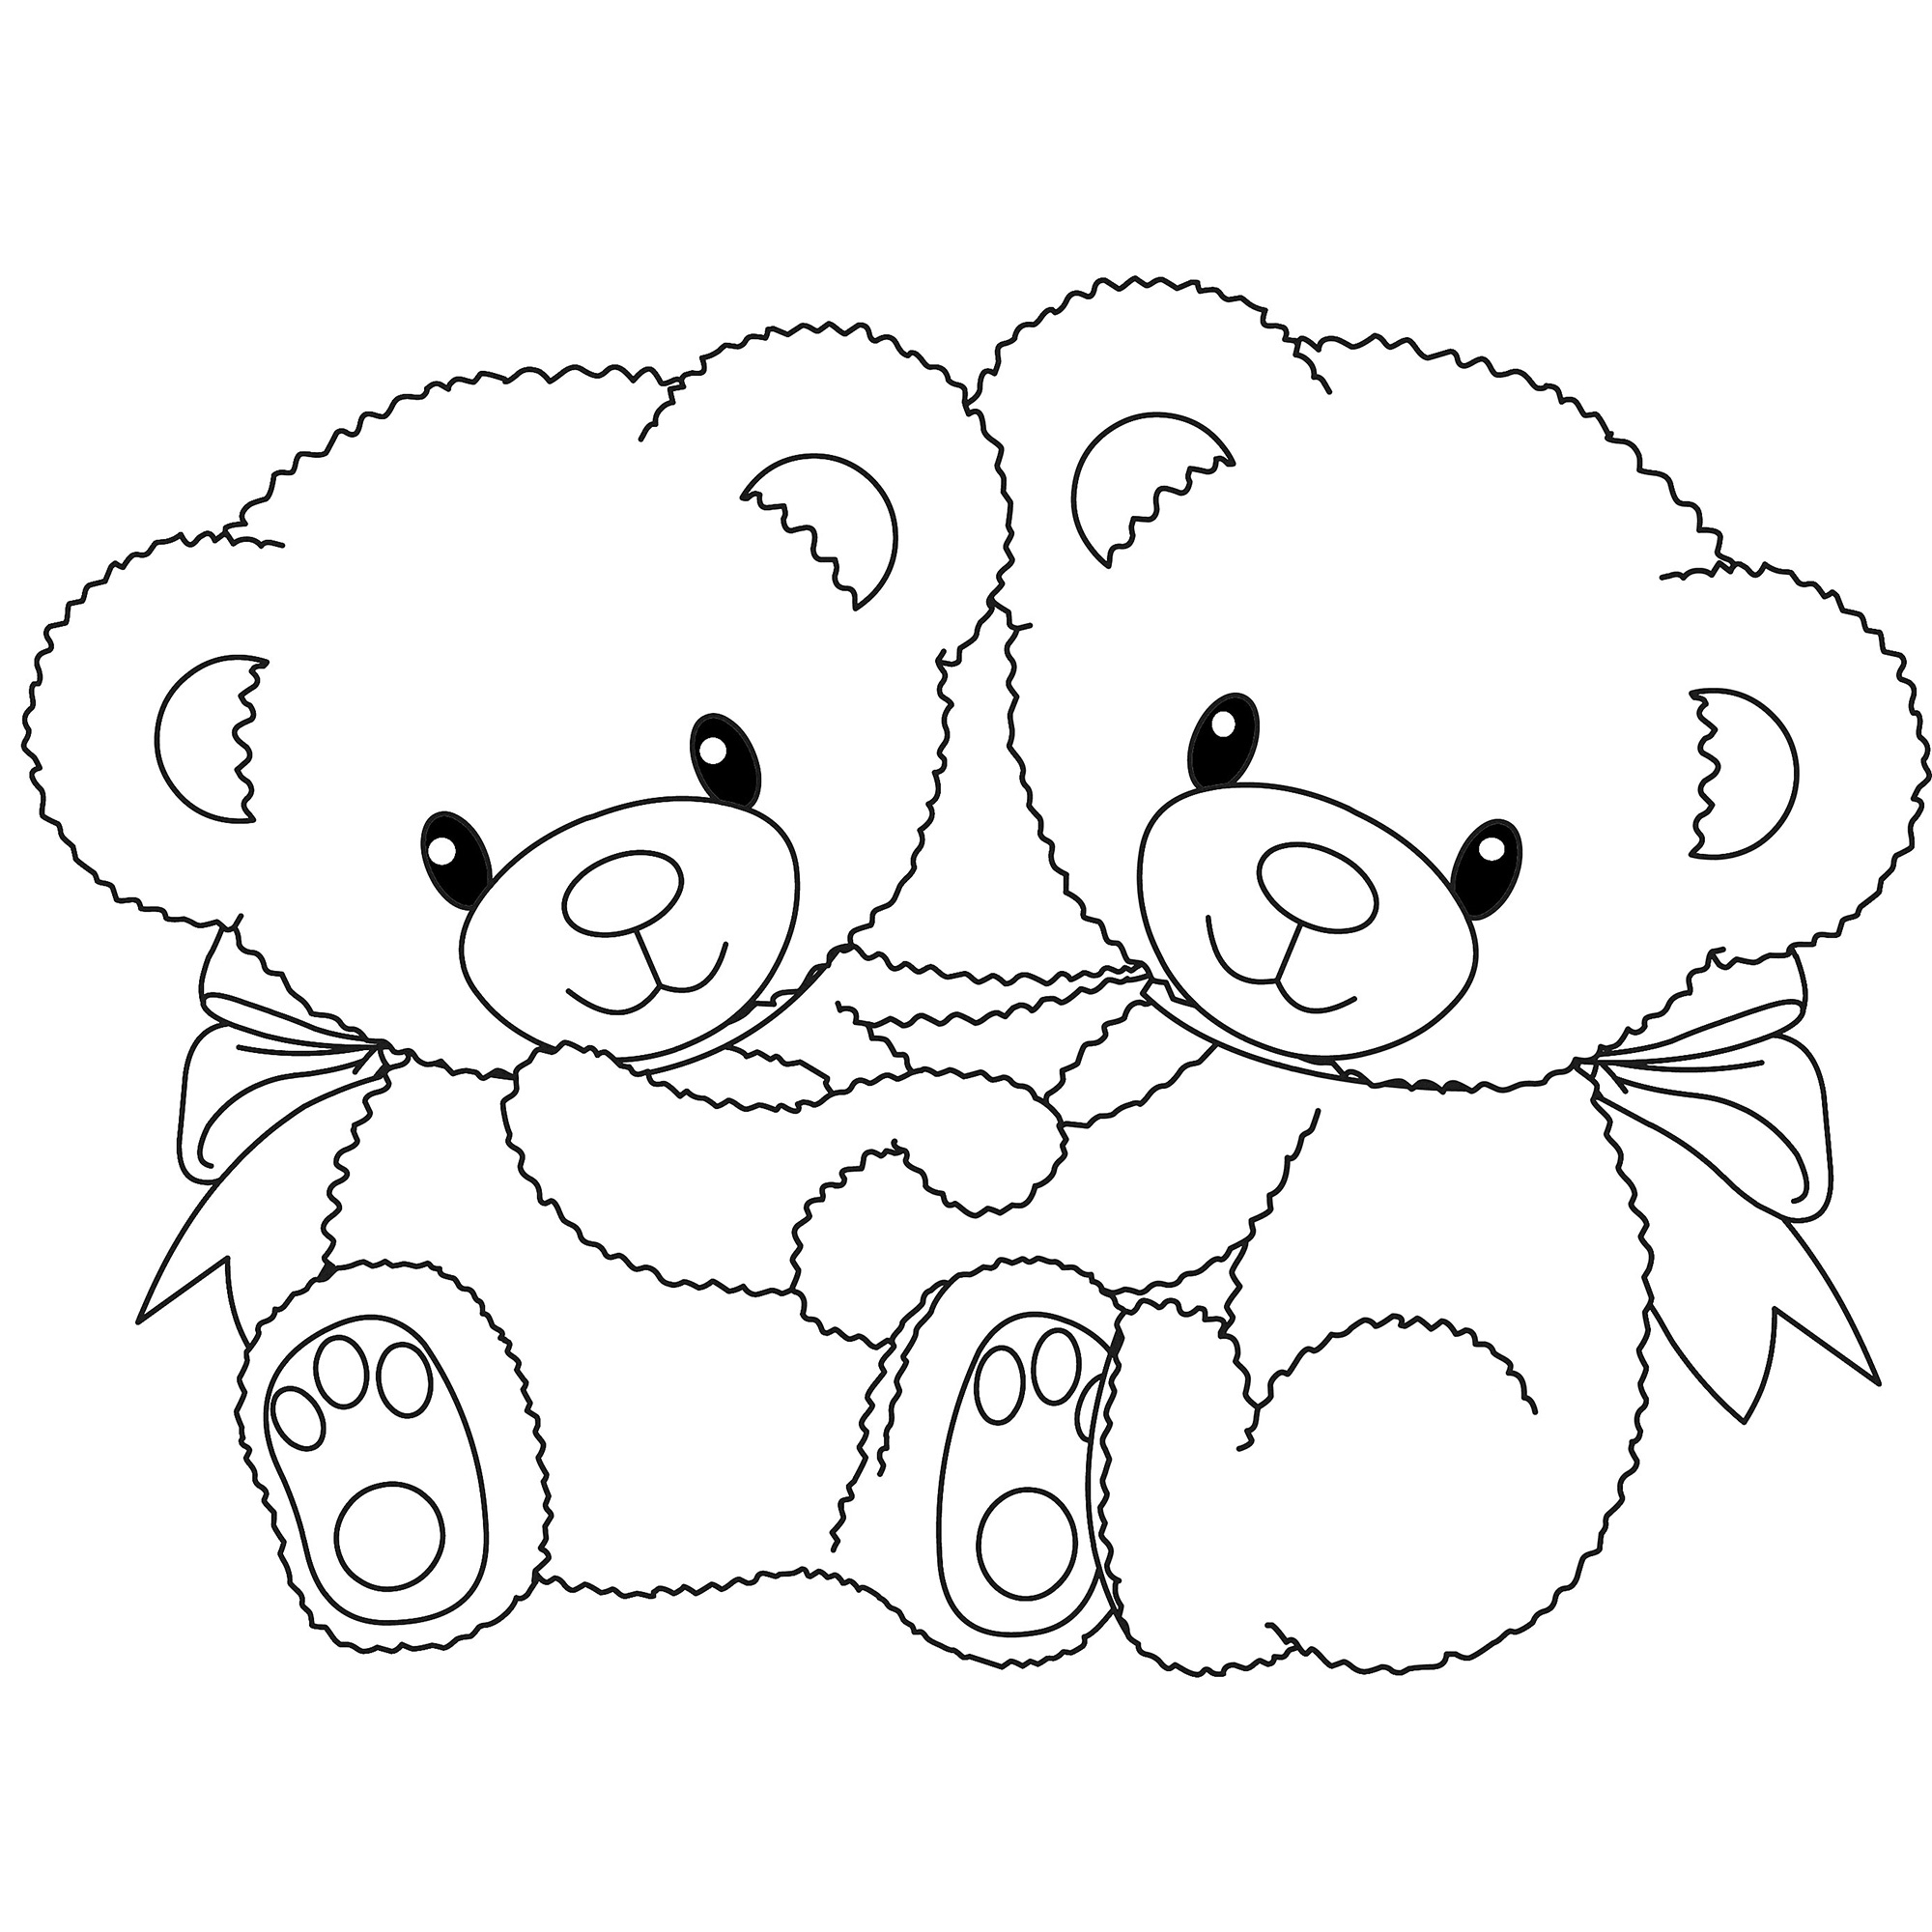 2000x2000 Two Cute Teddy Bears Drawings Drawn Love Teddy Bear